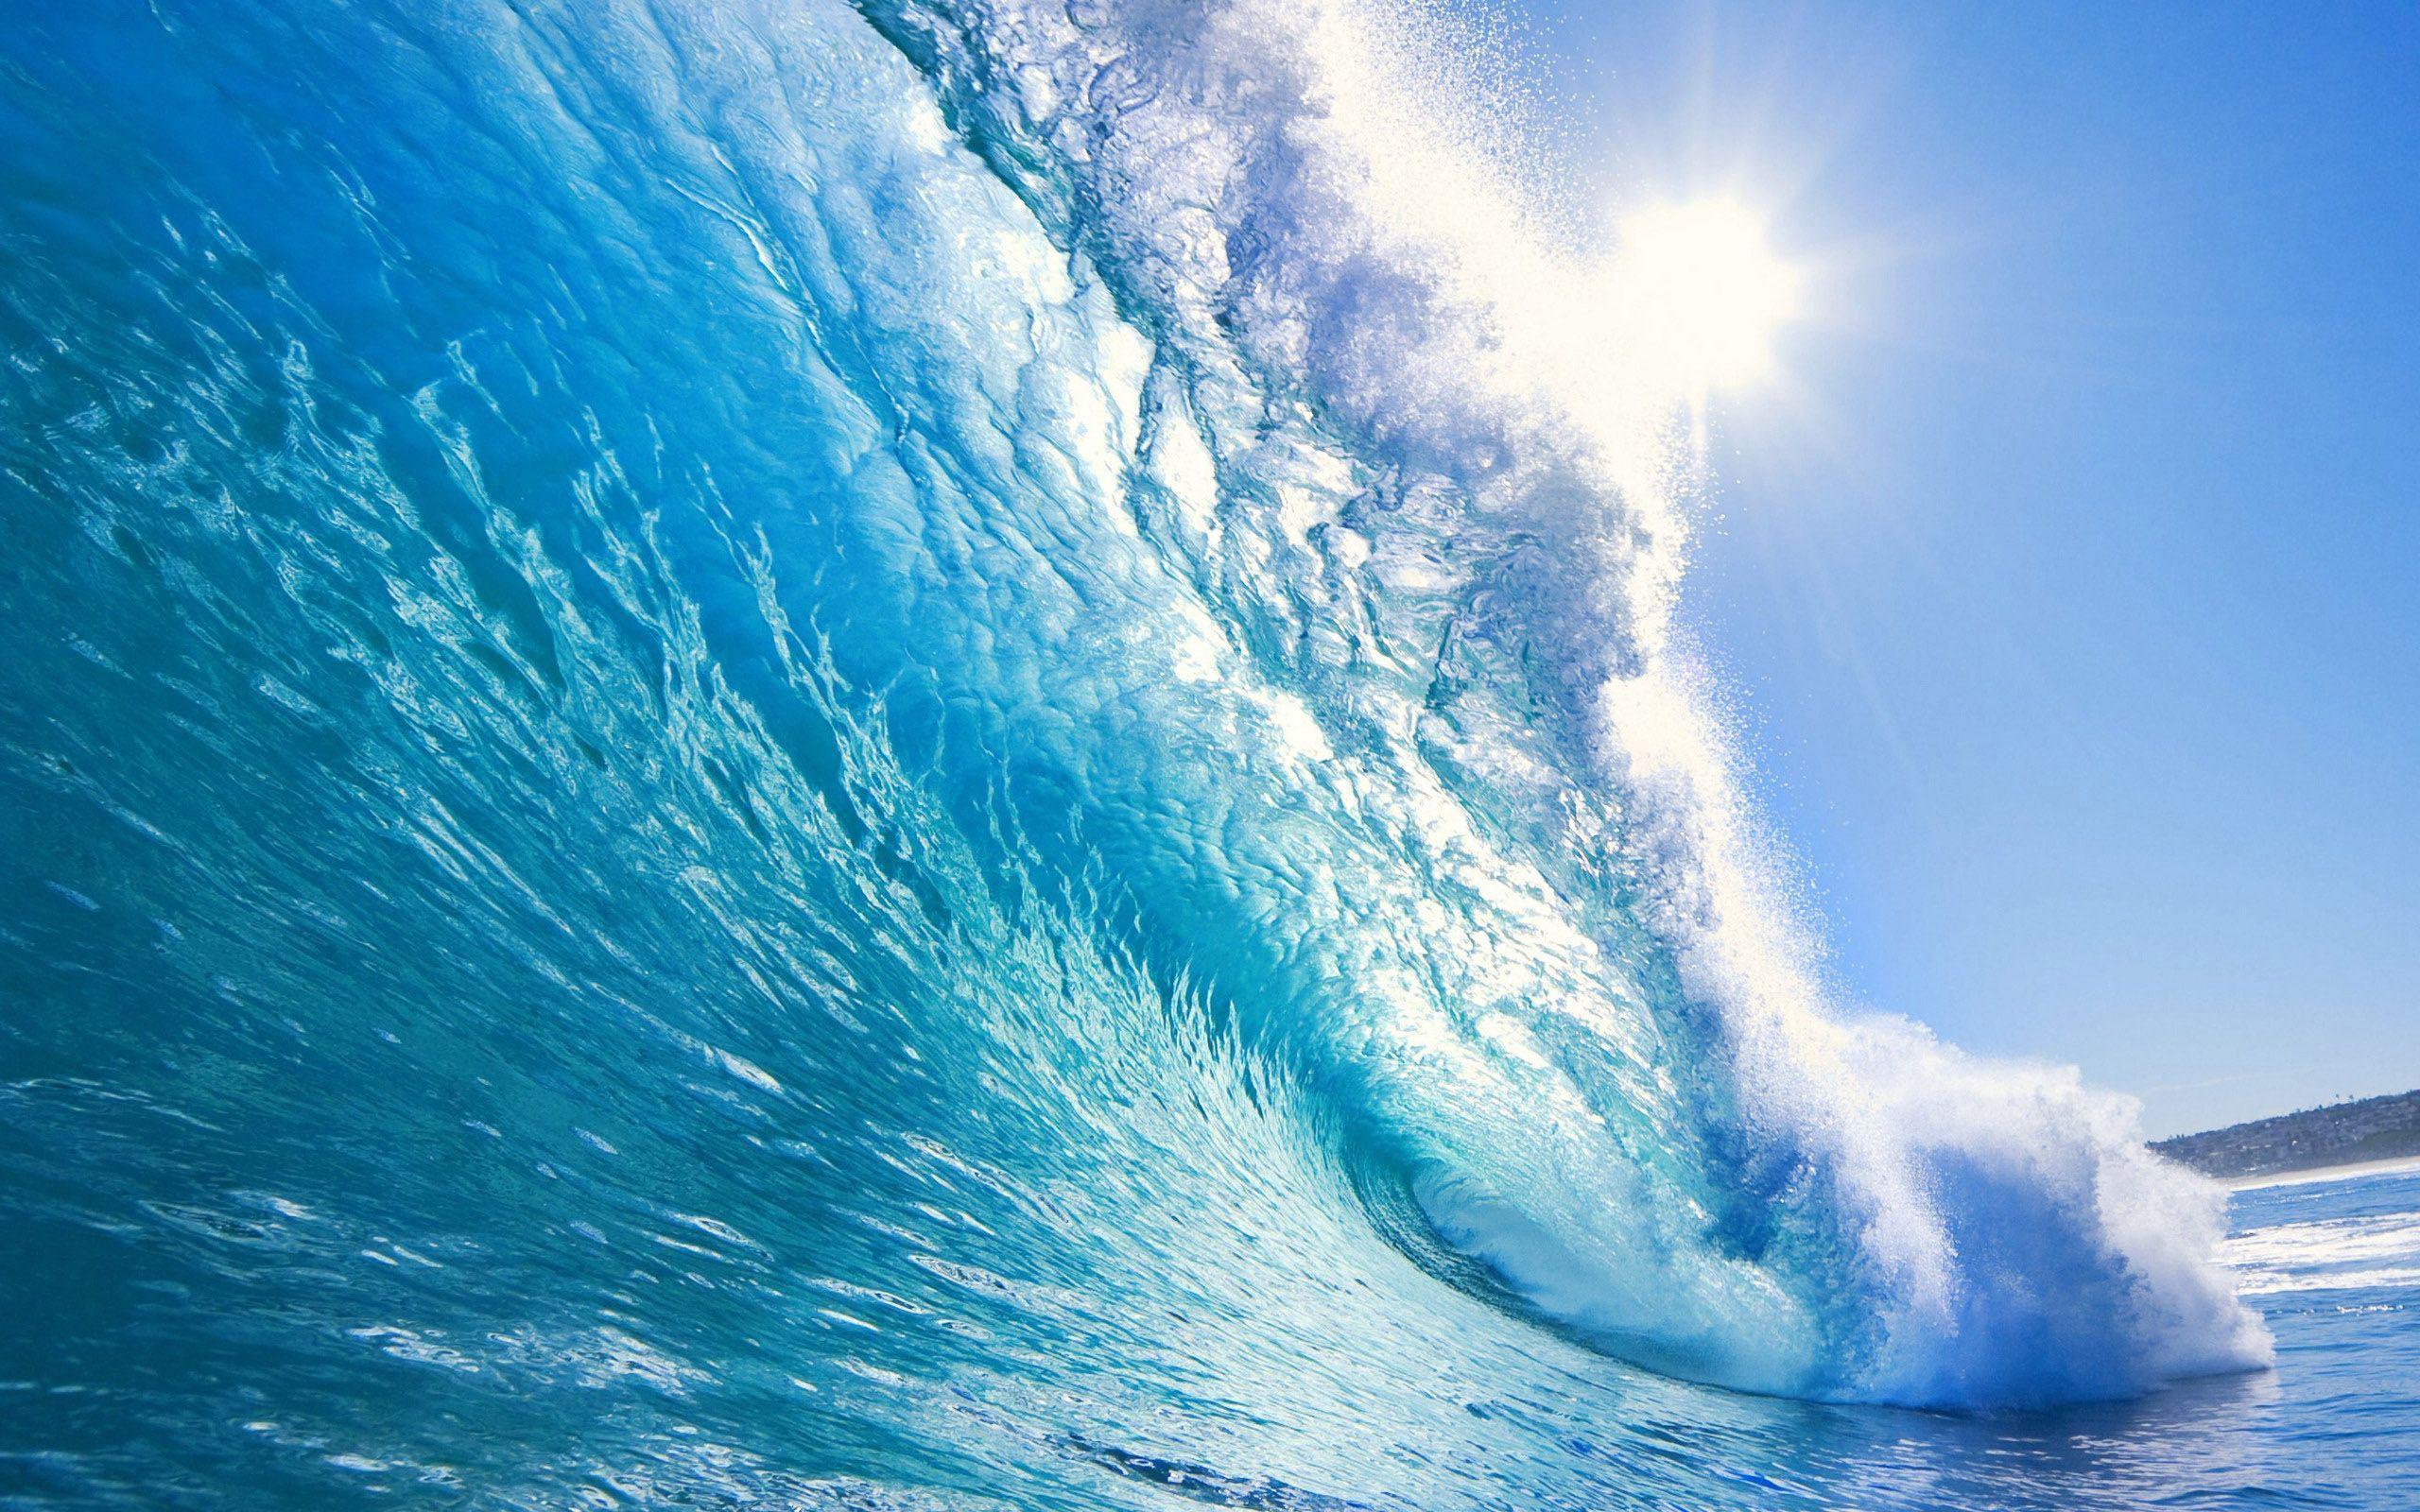 Elegant Wave wallpaper